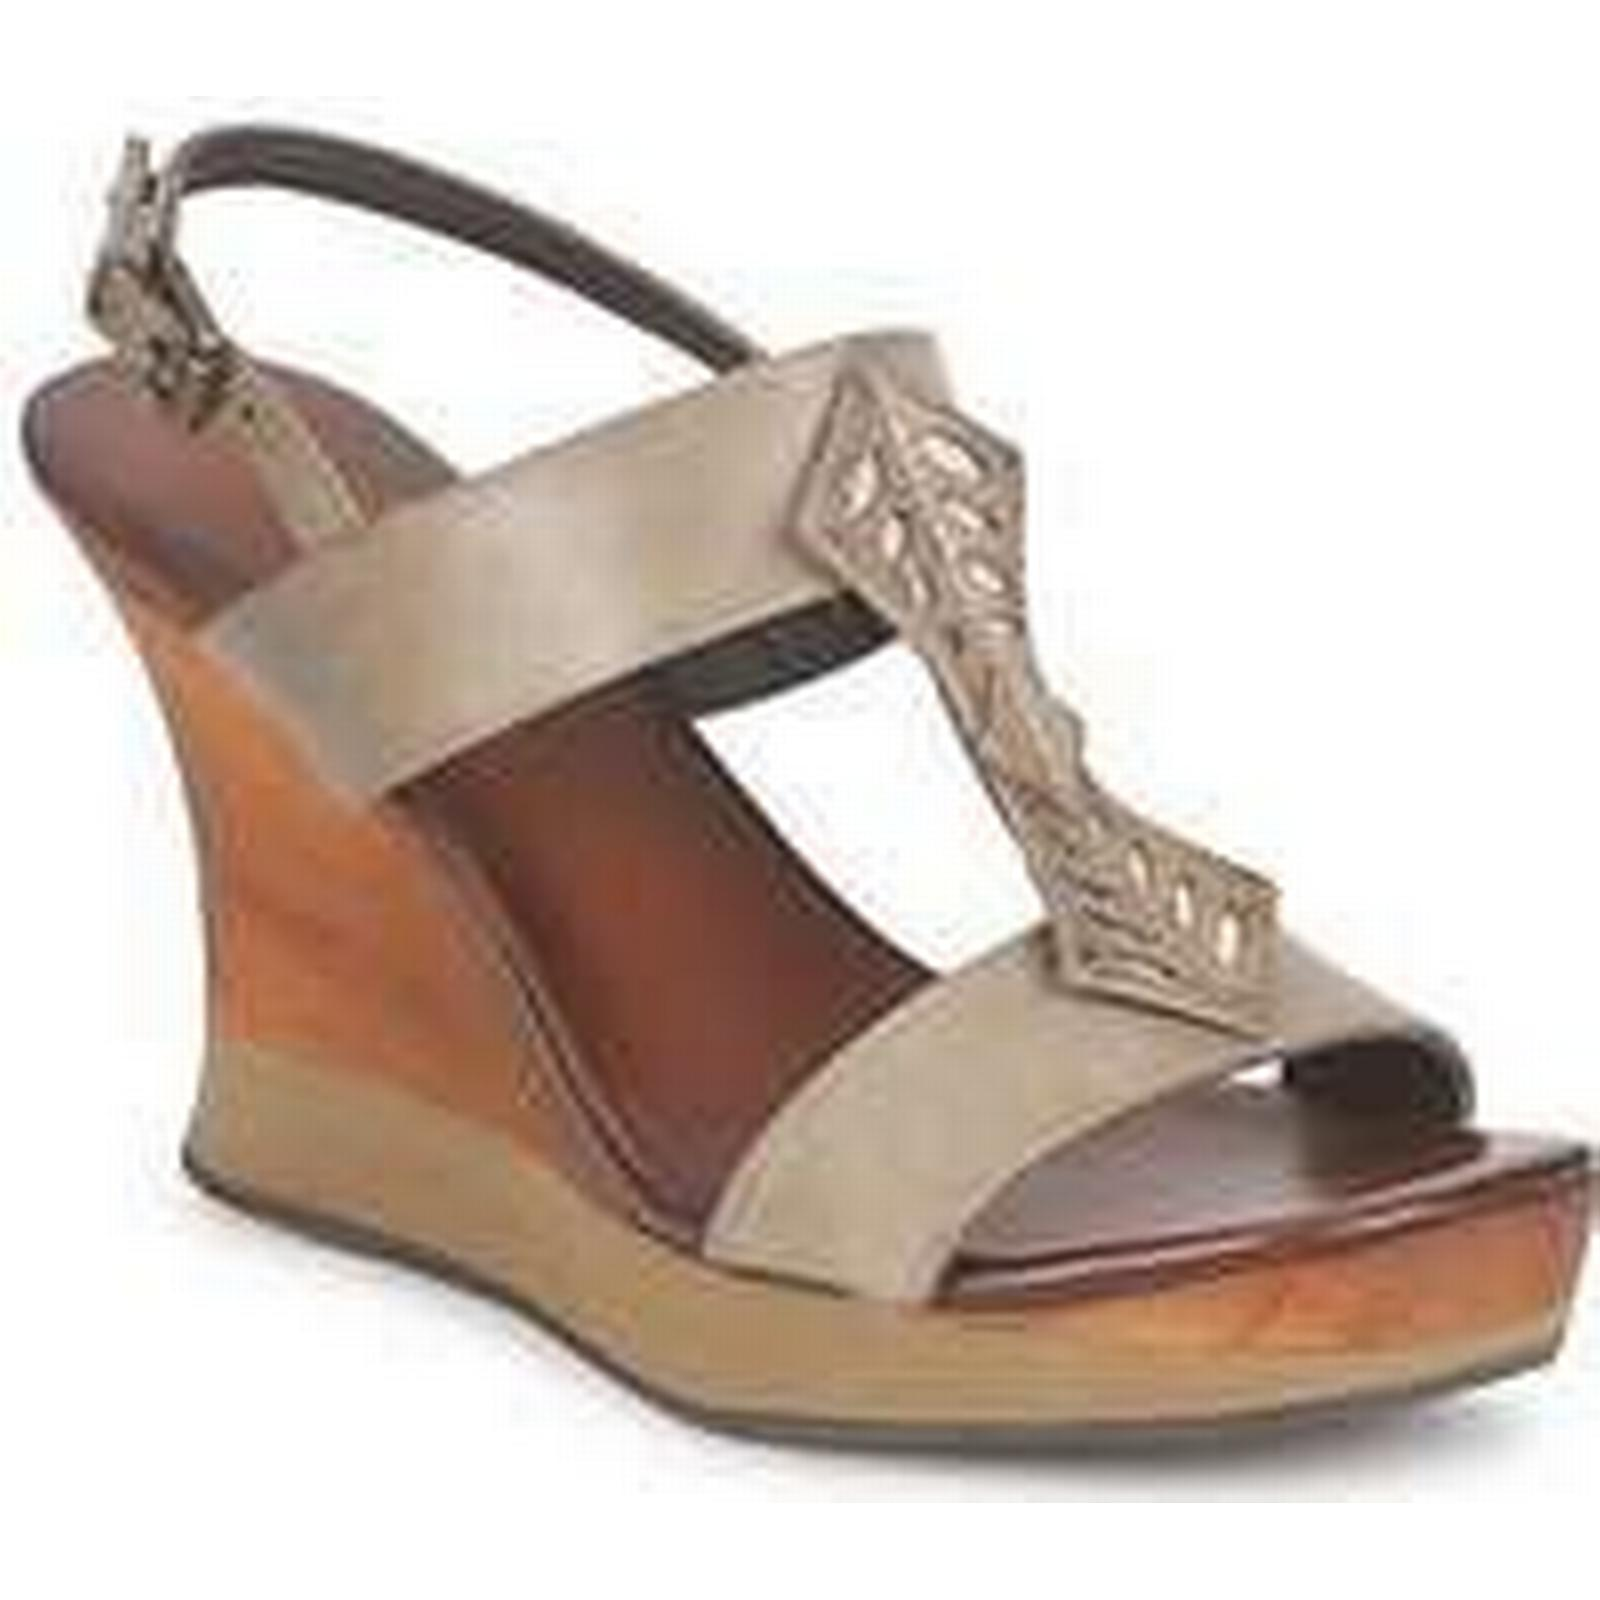 Spartoo.co.uk Audley in VELIA SERPI women's Sandals in Audley Brown 6cfae4